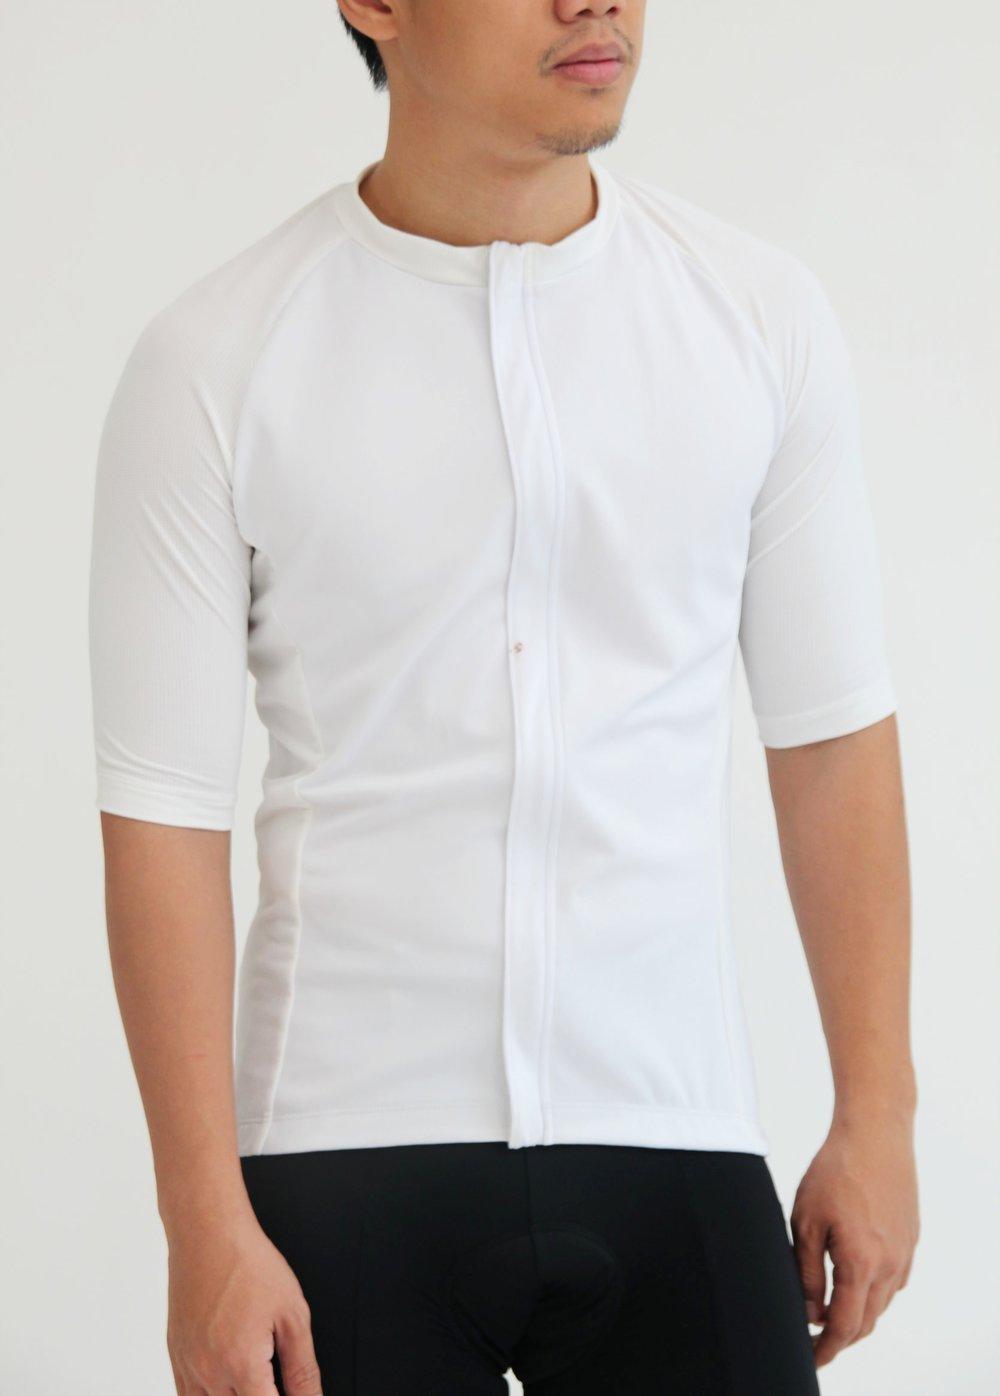 Race cut cycling jersey (Raglan sleeve) — Yimage Design Studio ... 5be687b1f